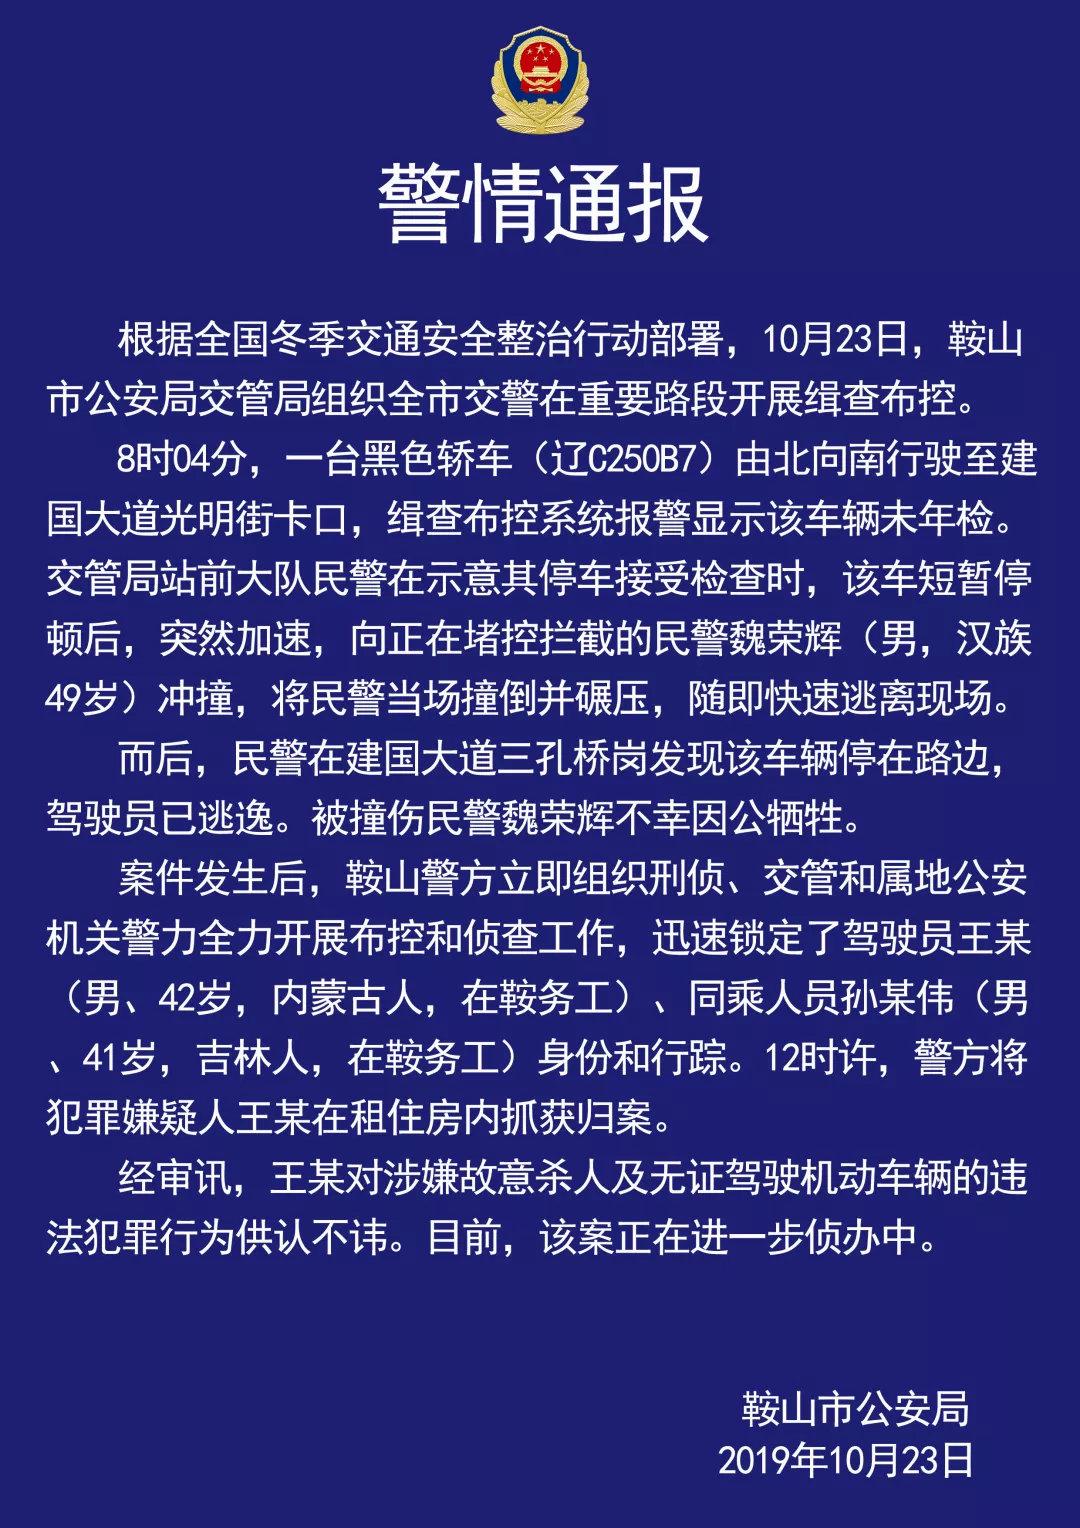 http://www.as0898.com/wenhuayichan/14892.html